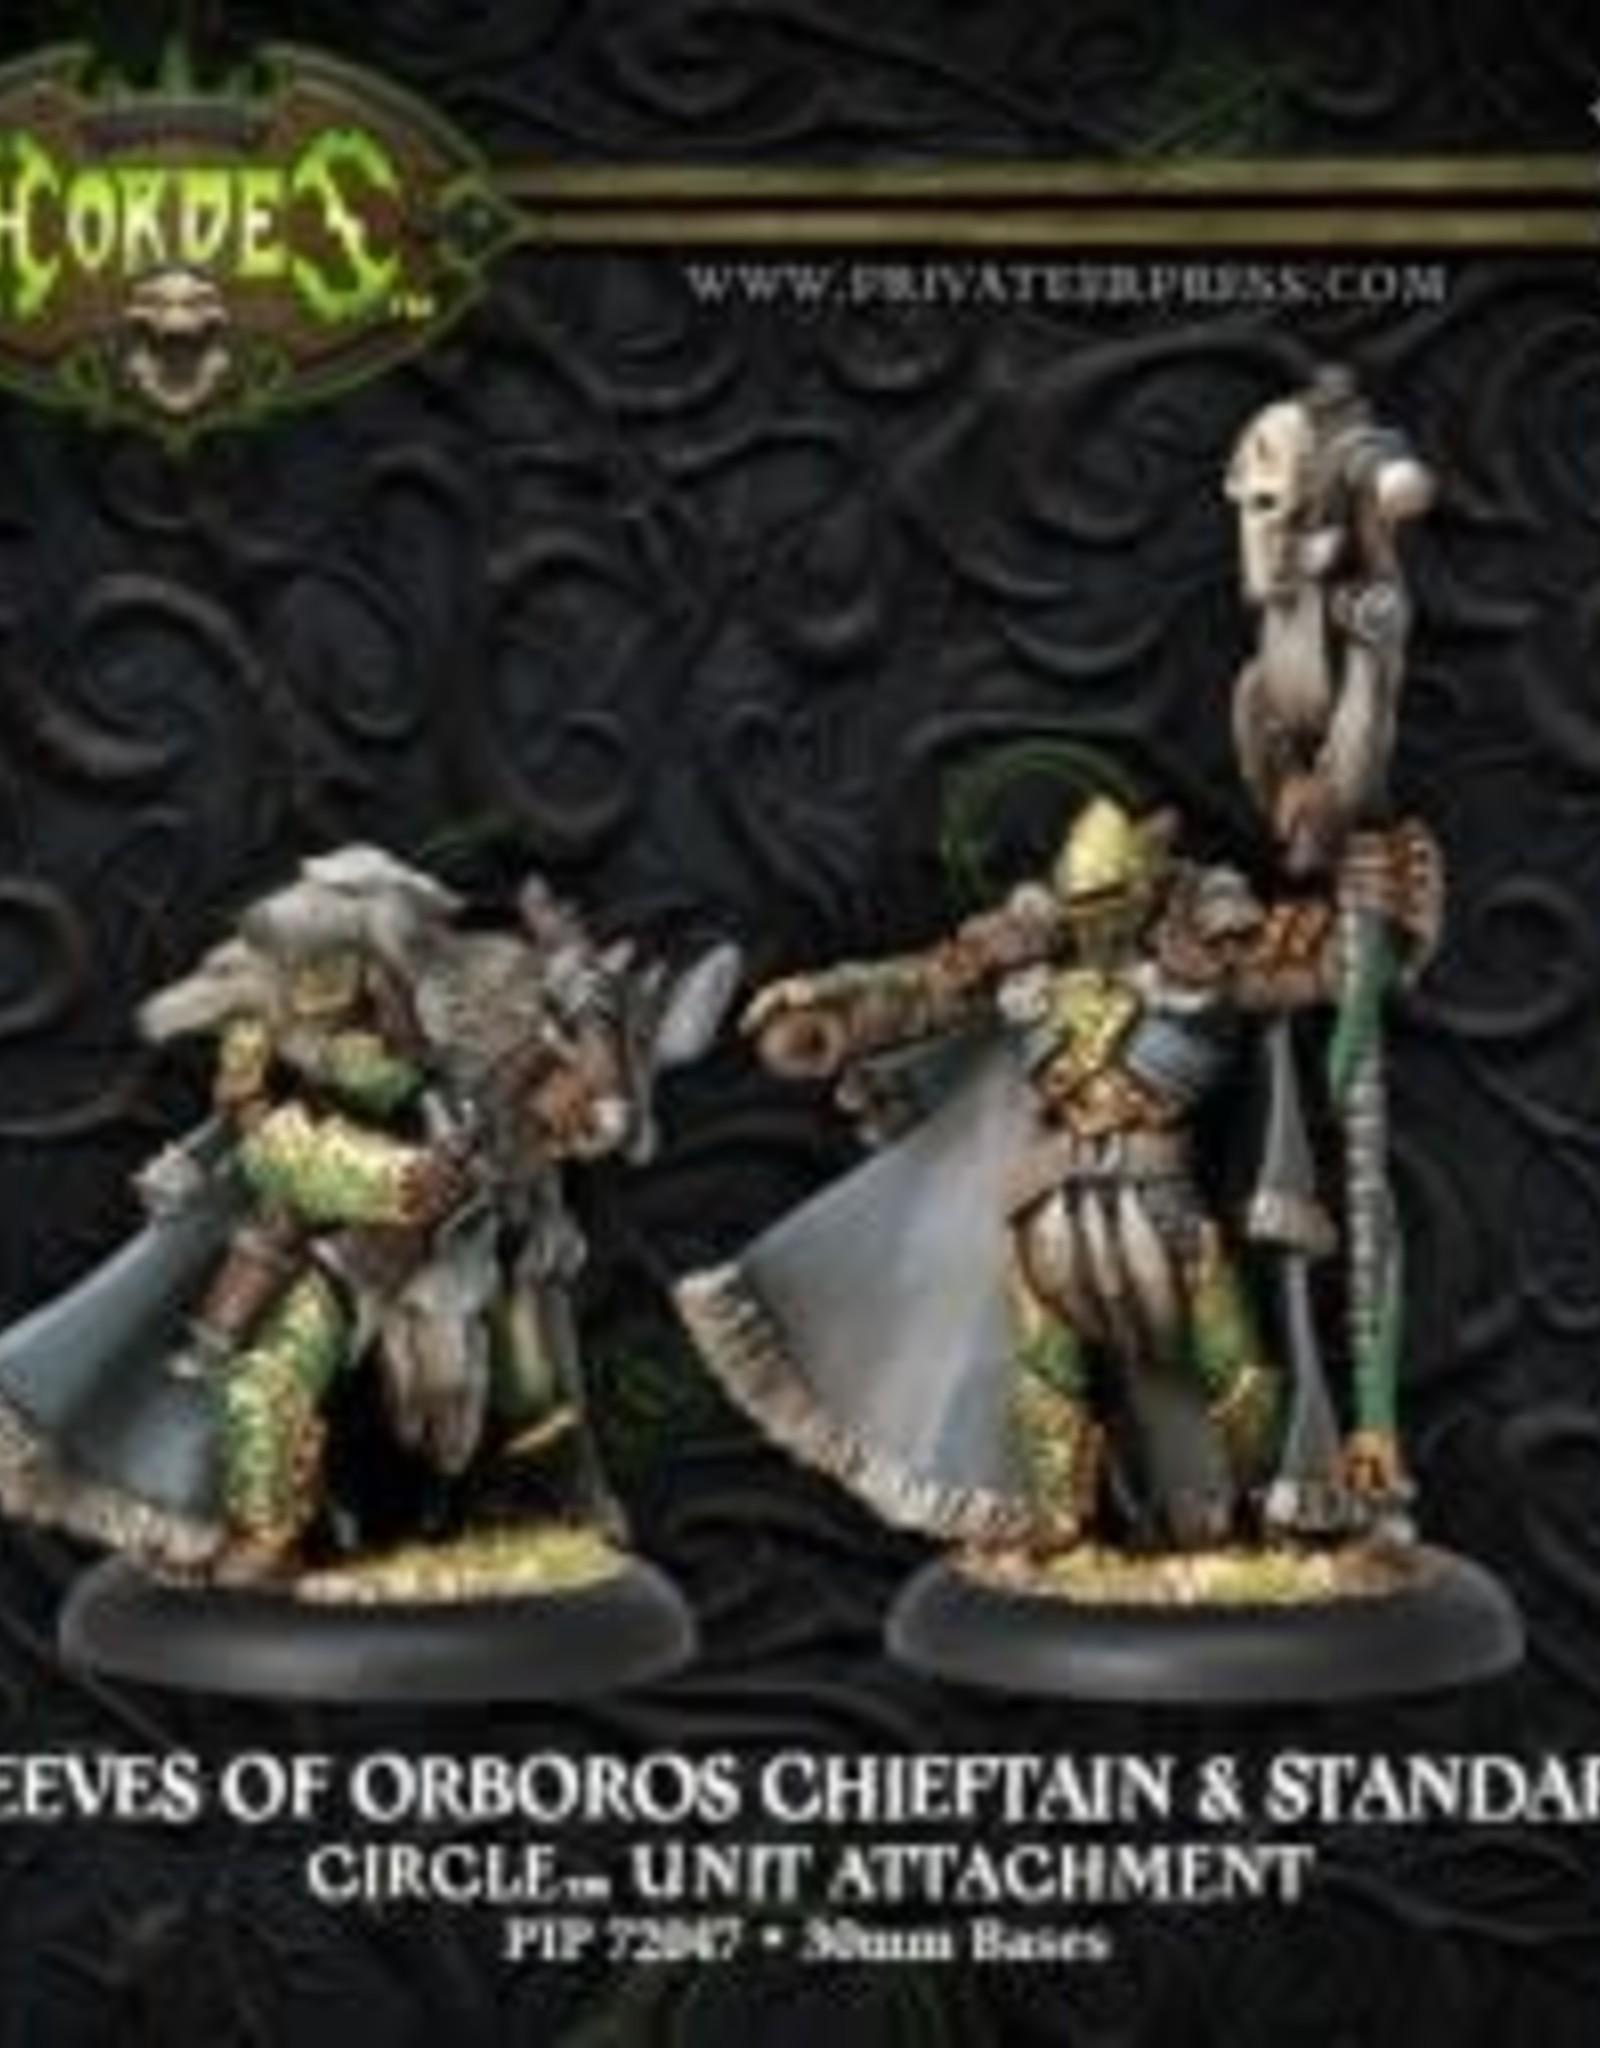 Hordes Circle - Reeves of Oboros Chieftain & Standard